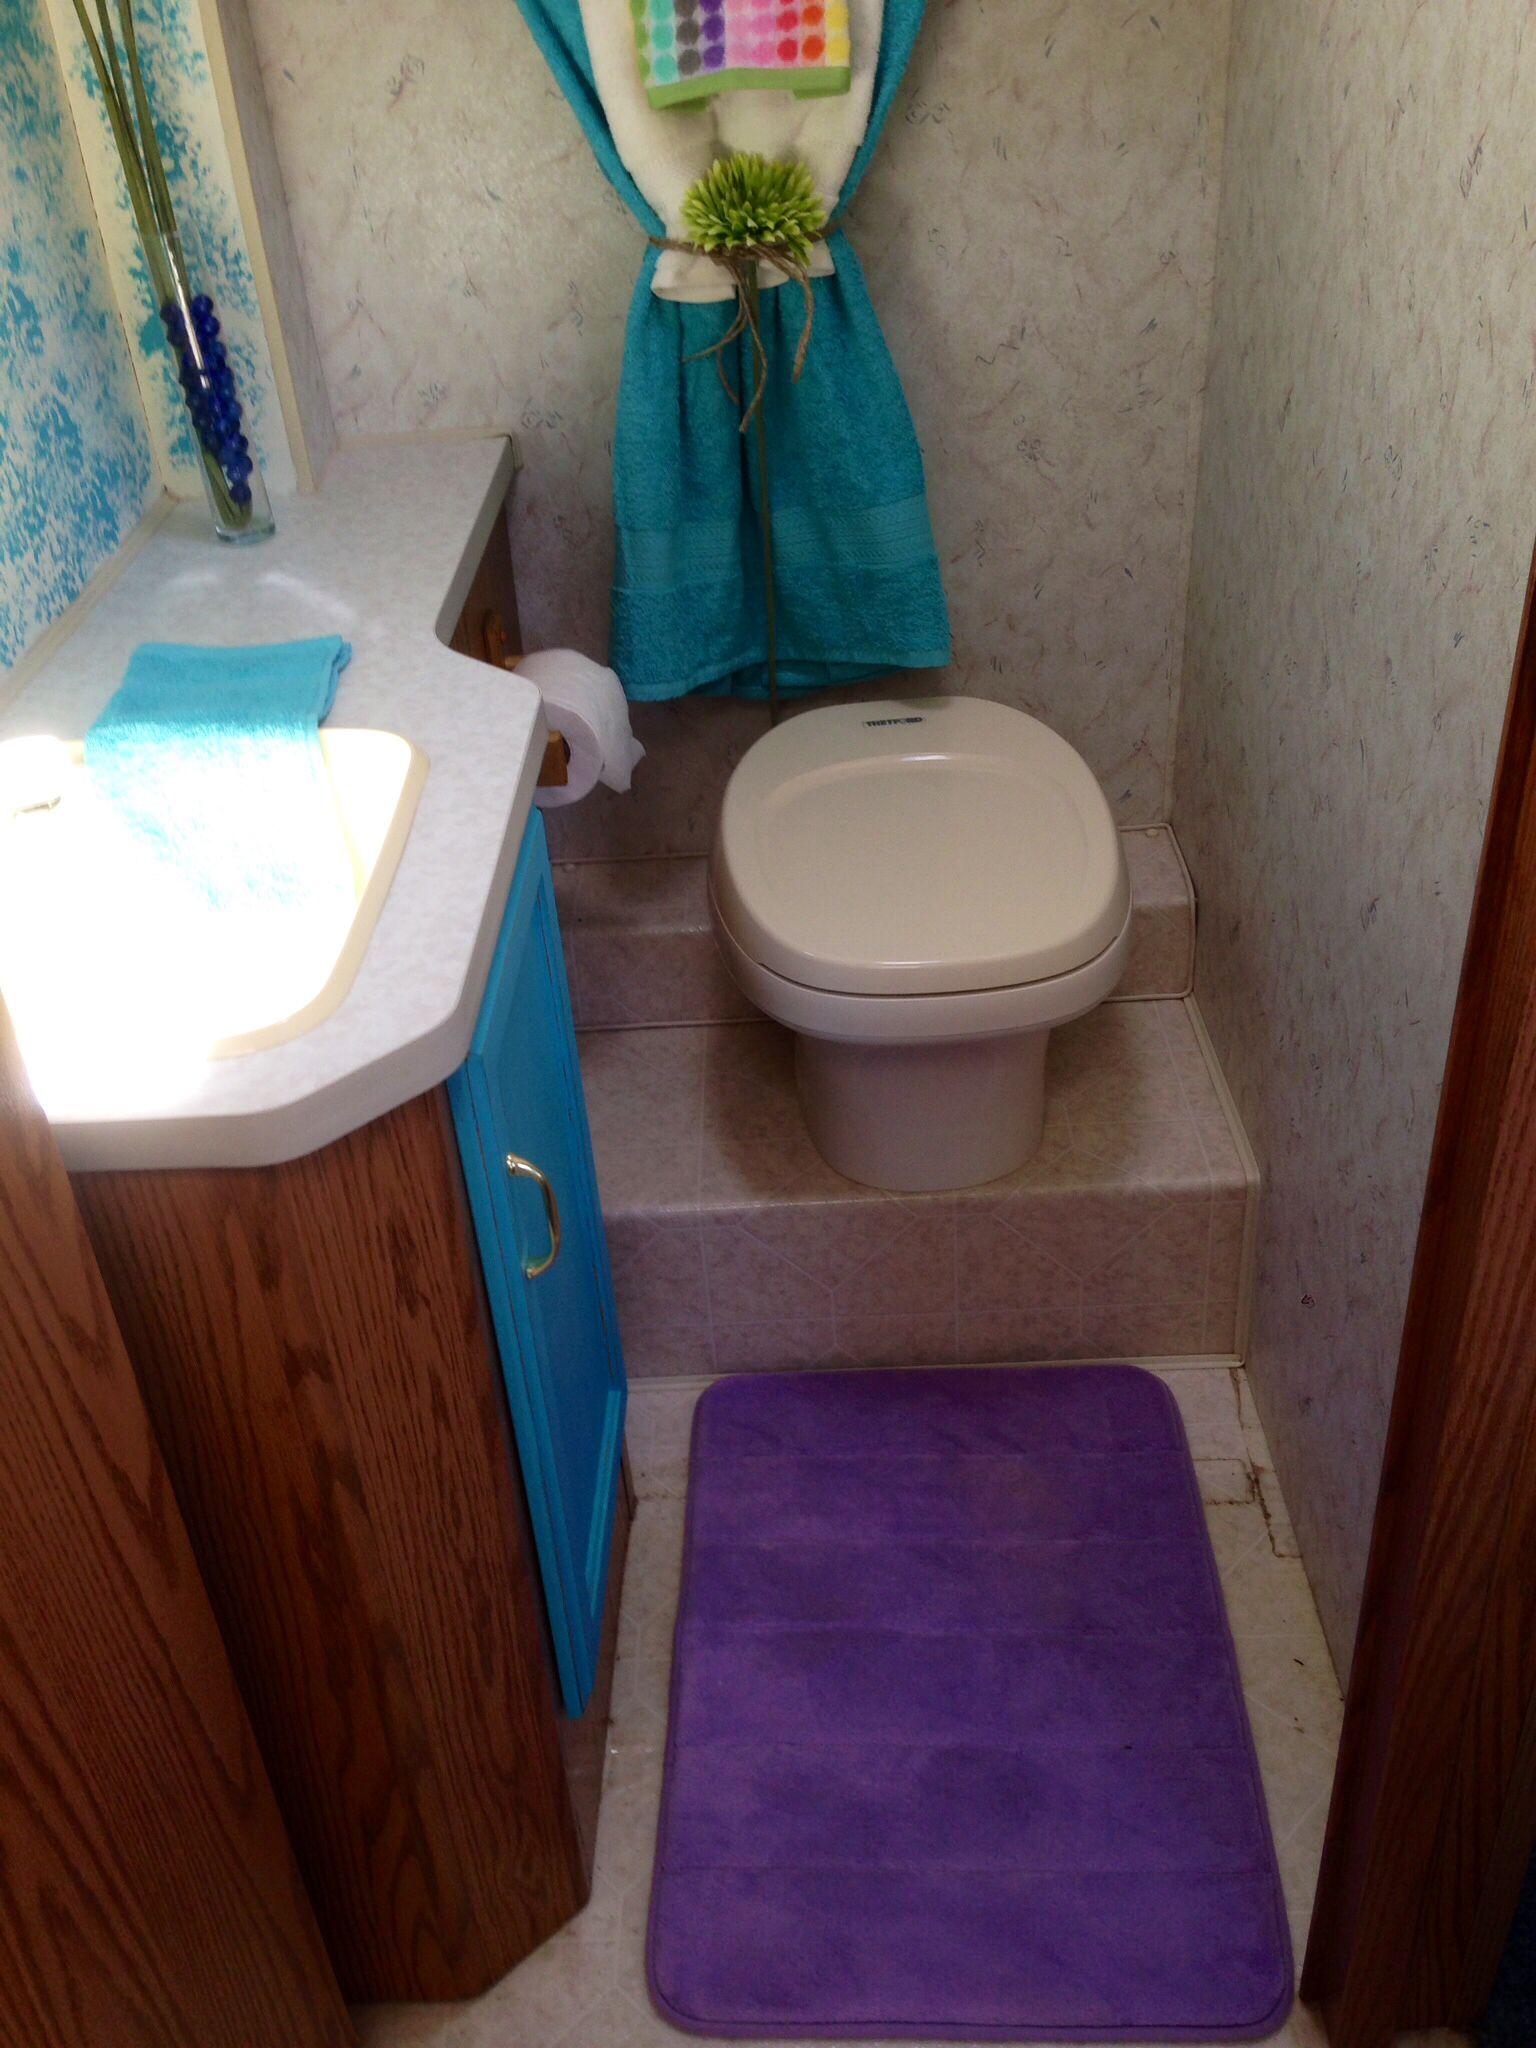 Bathroom redecorating